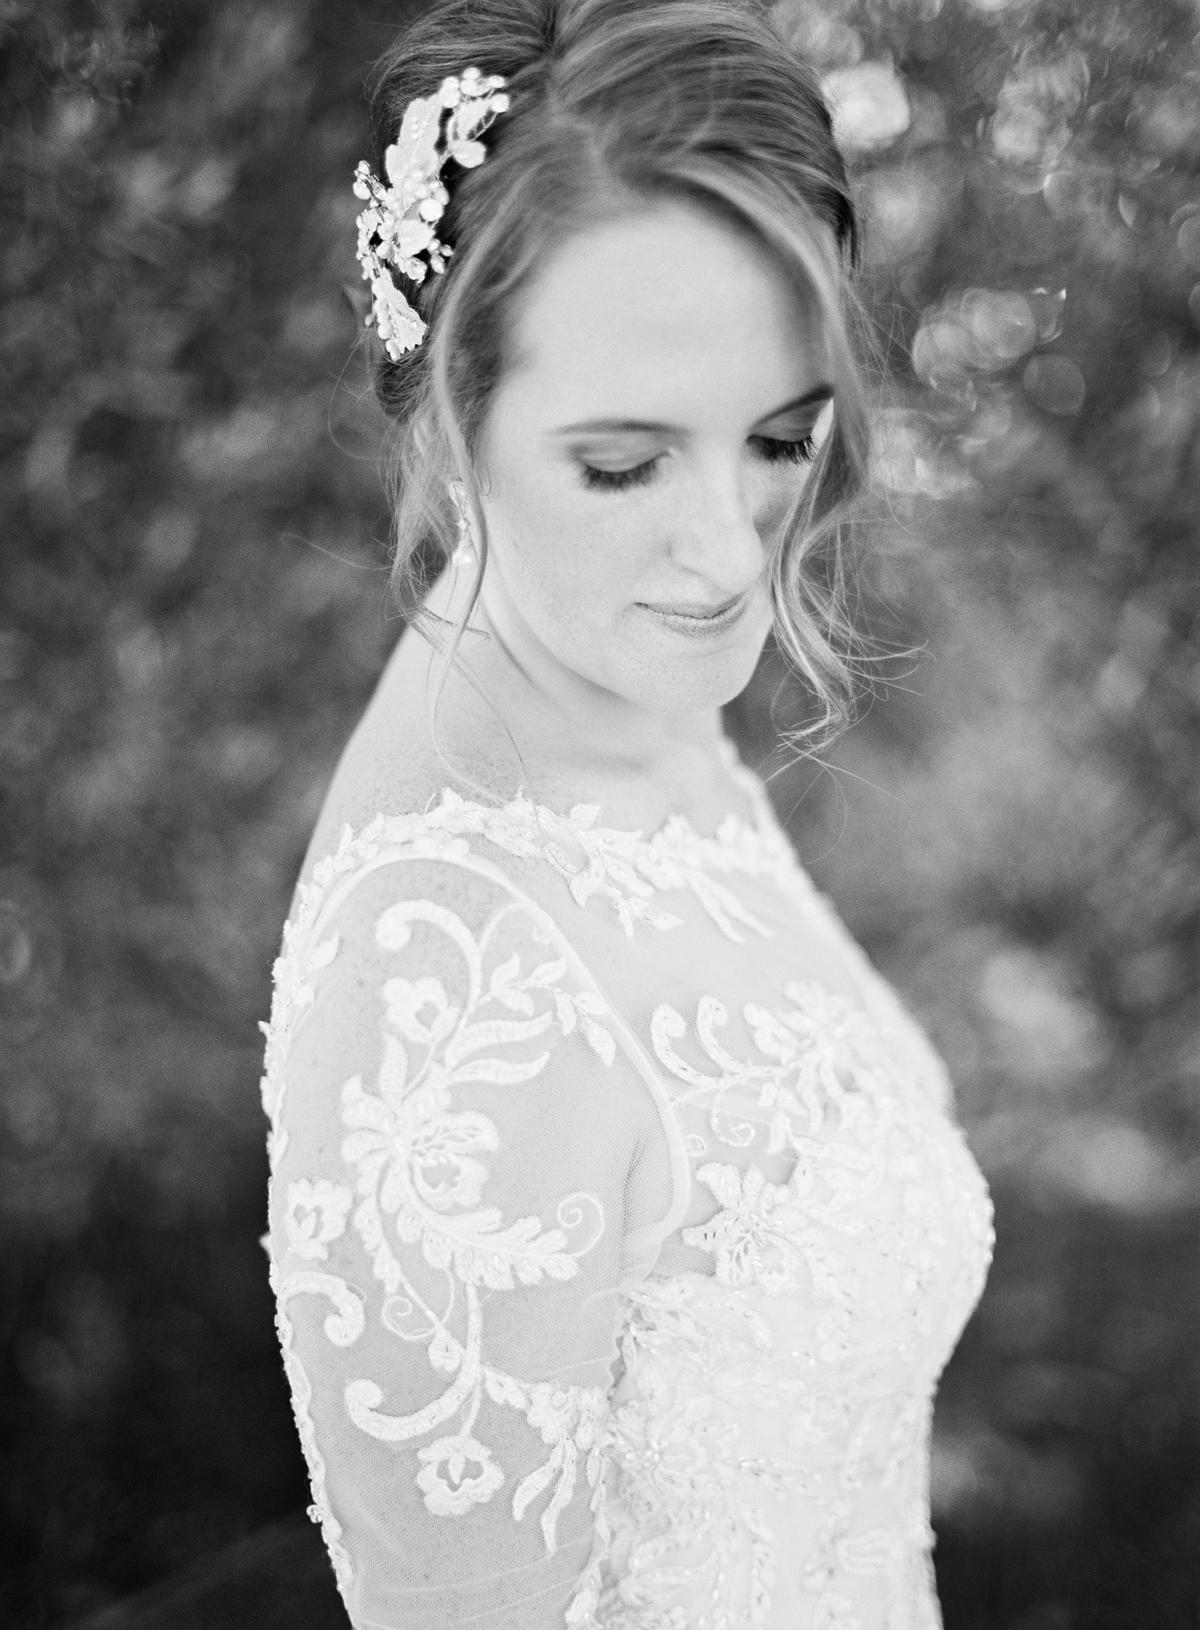 The Vine Grove Mudgee Wedding, Photography by Mr Edwards_1810.jpg